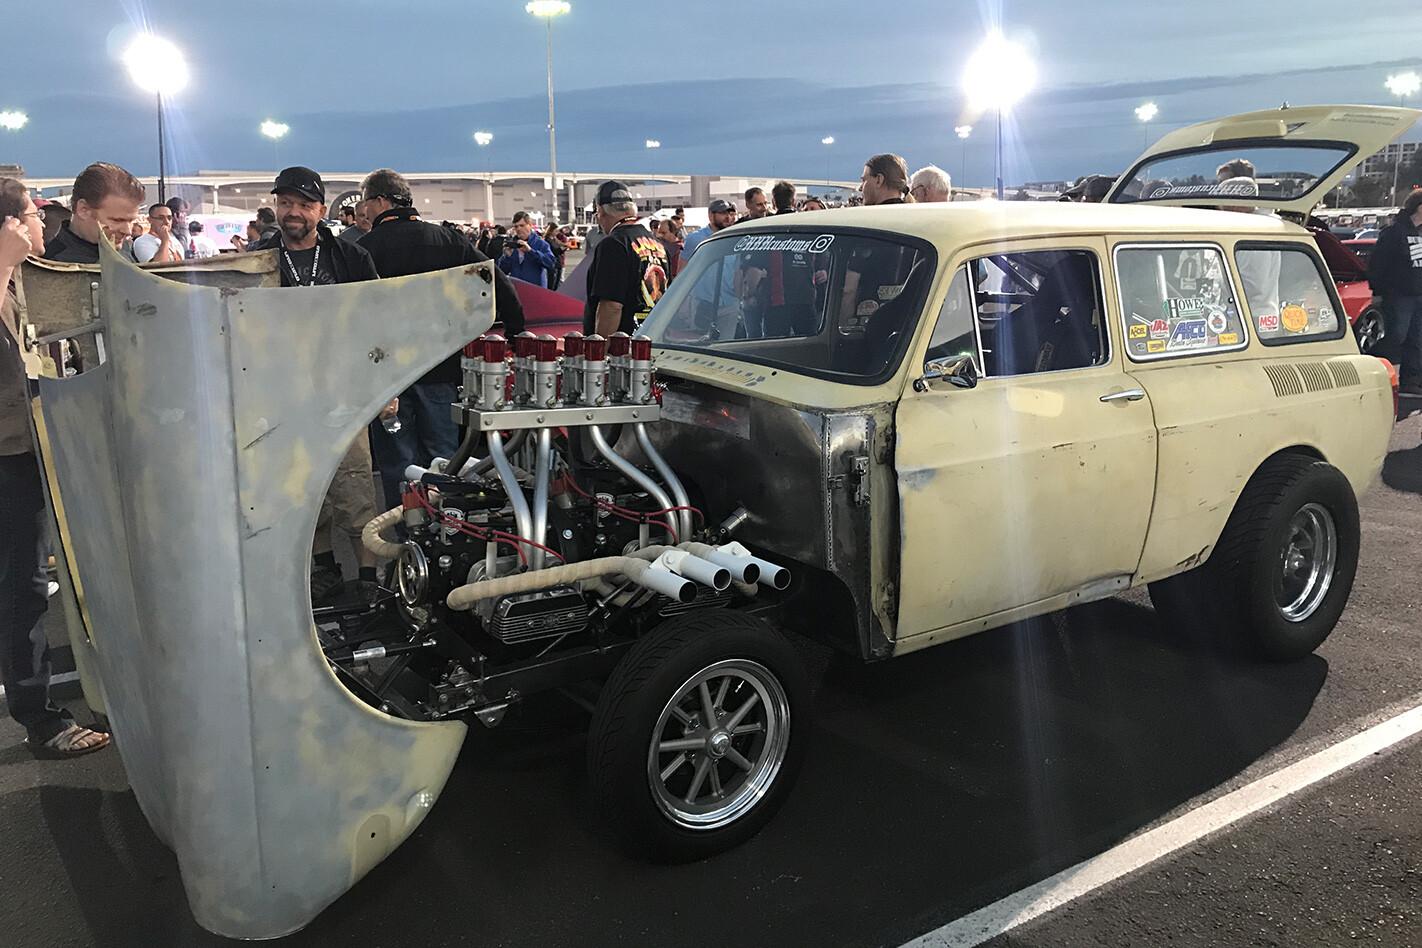 VW twin engine gasser